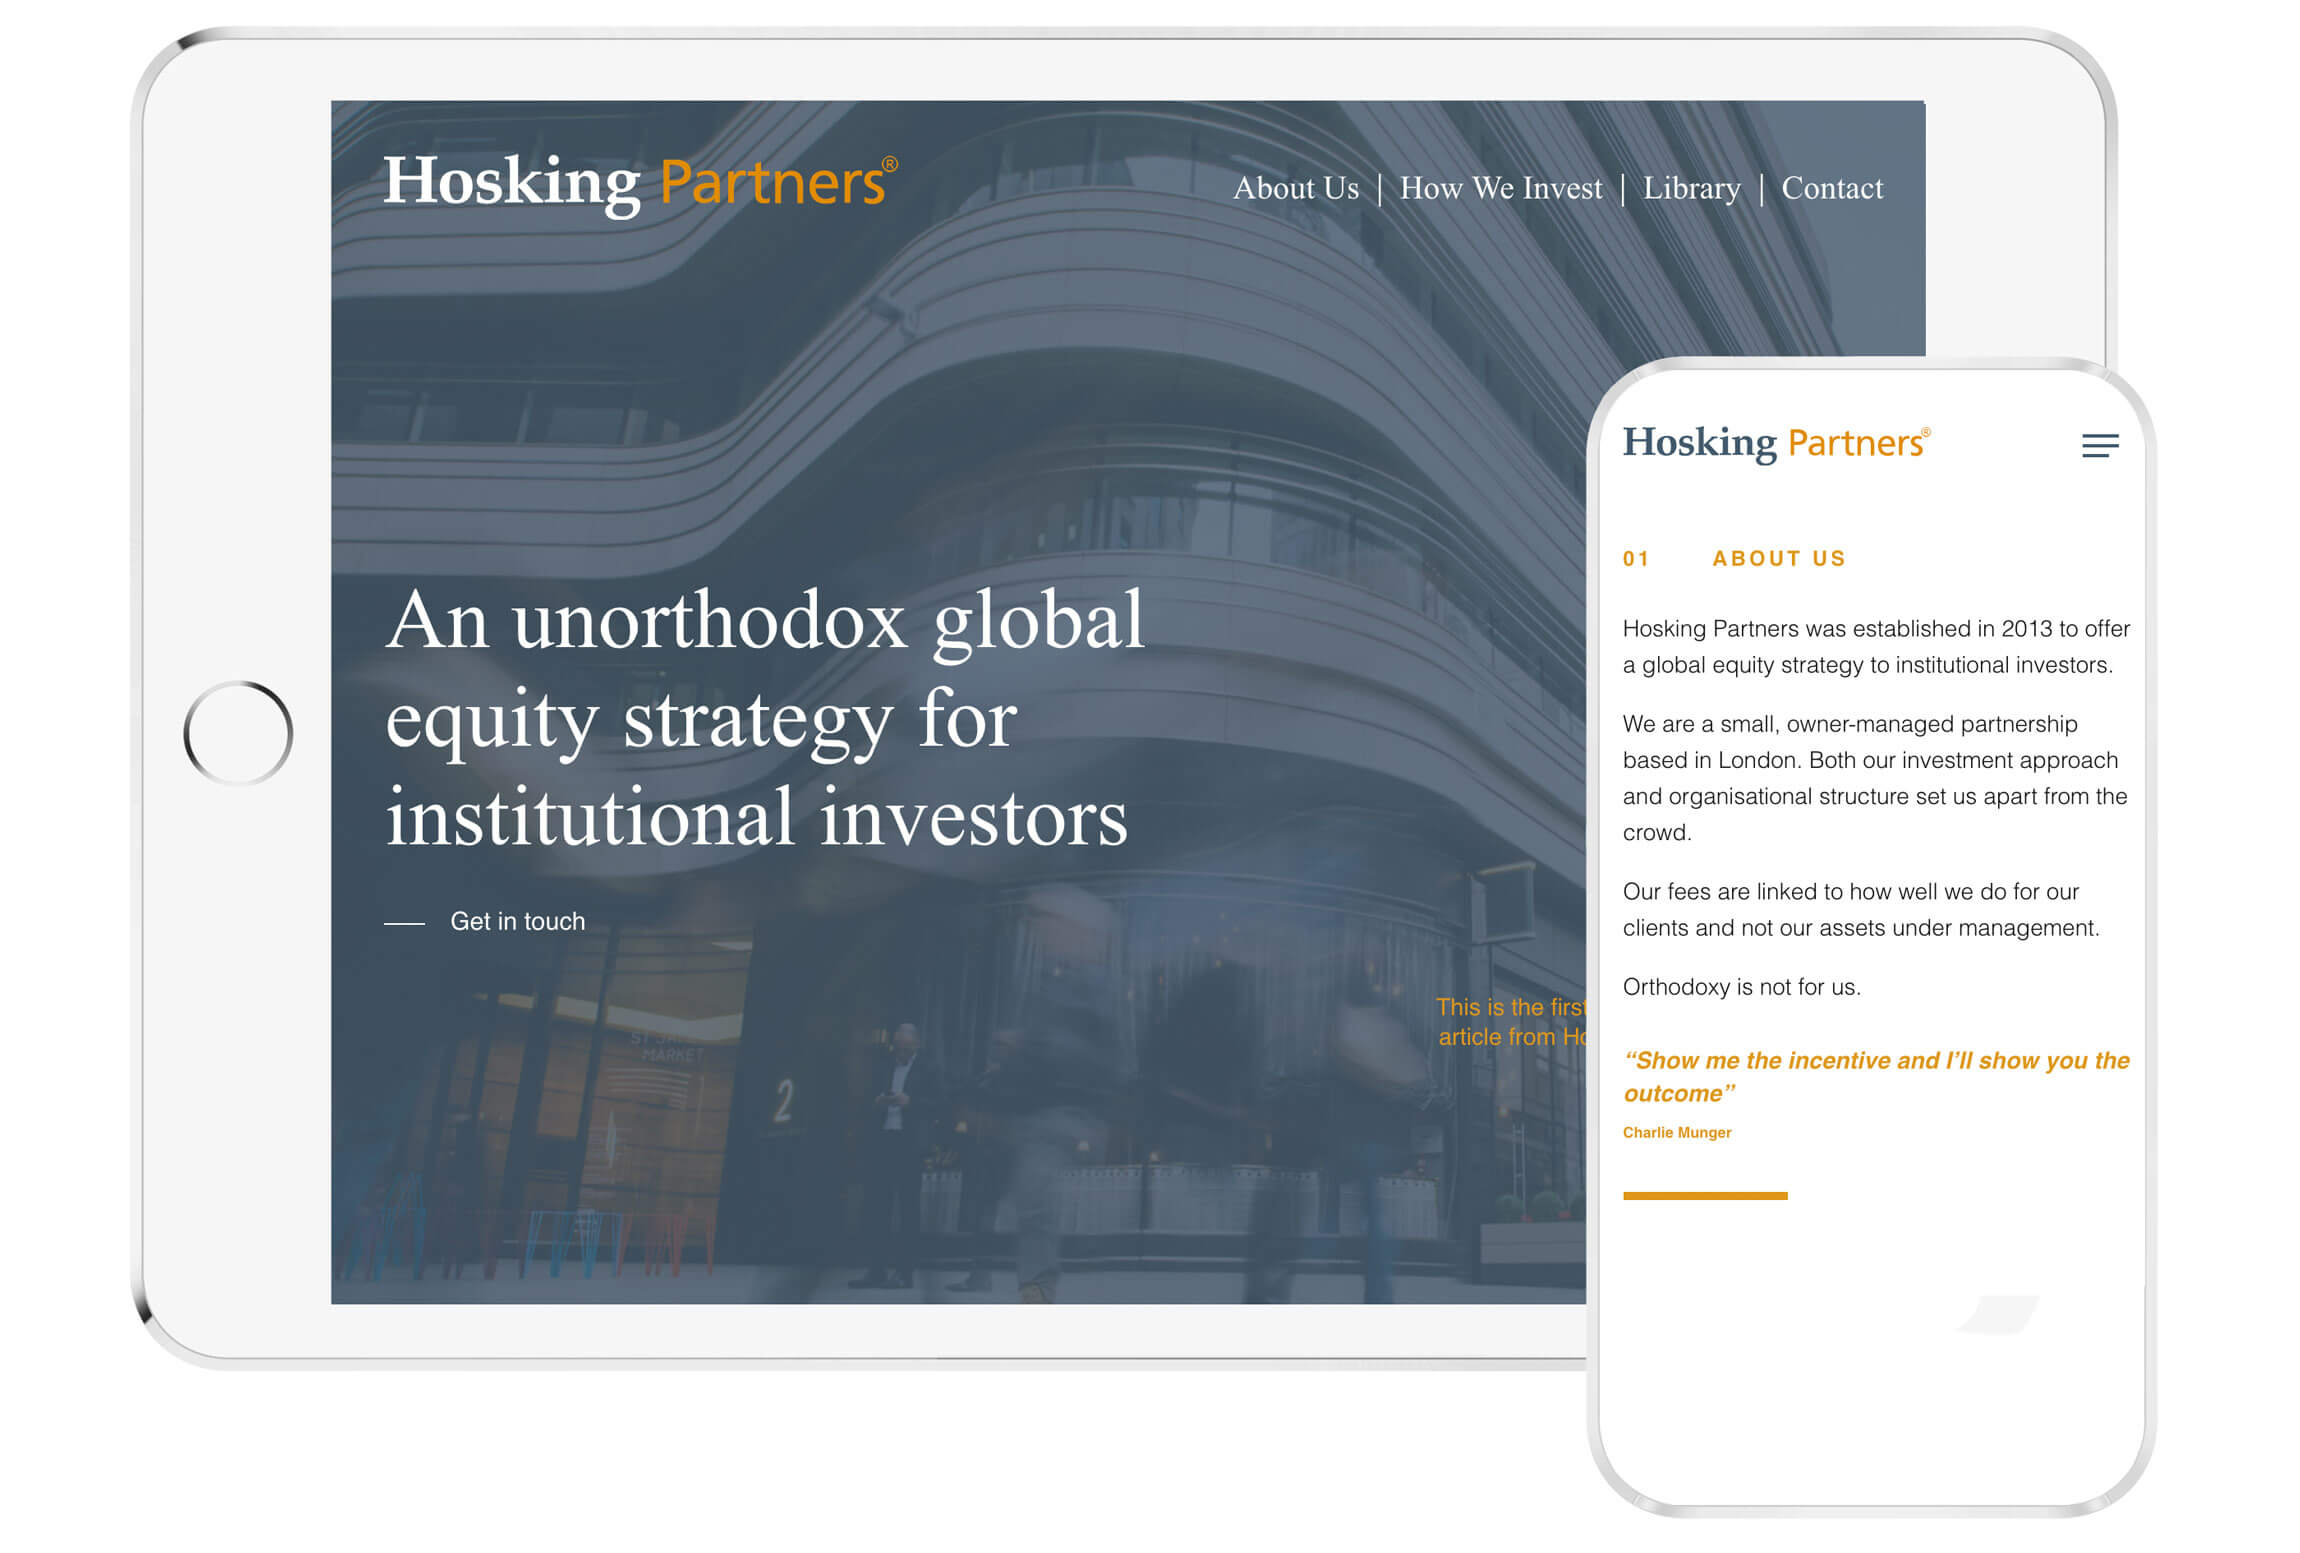 hosking partners web design mockup